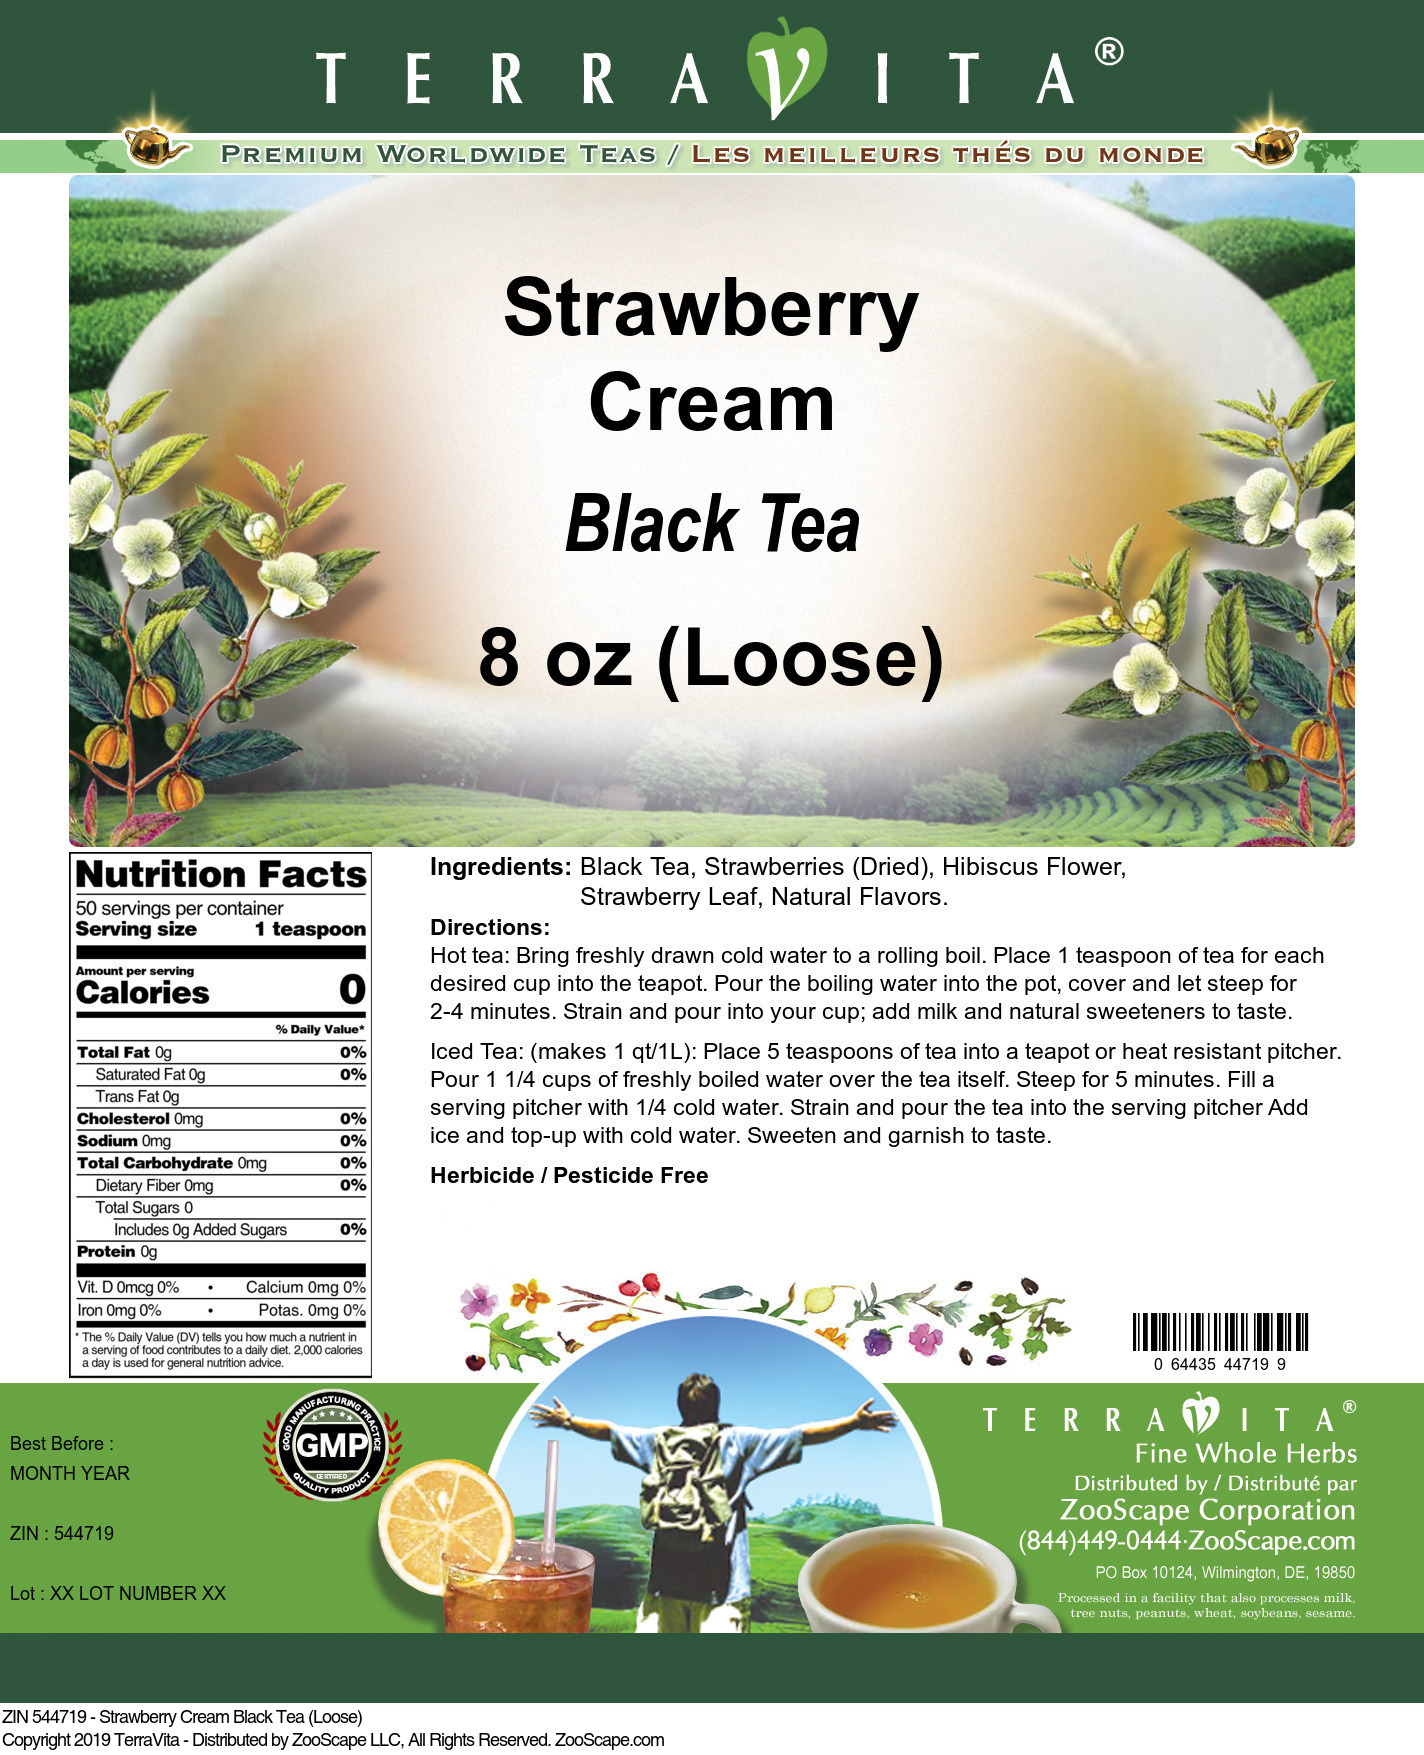 Strawberry Cream Black Tea (Loose)